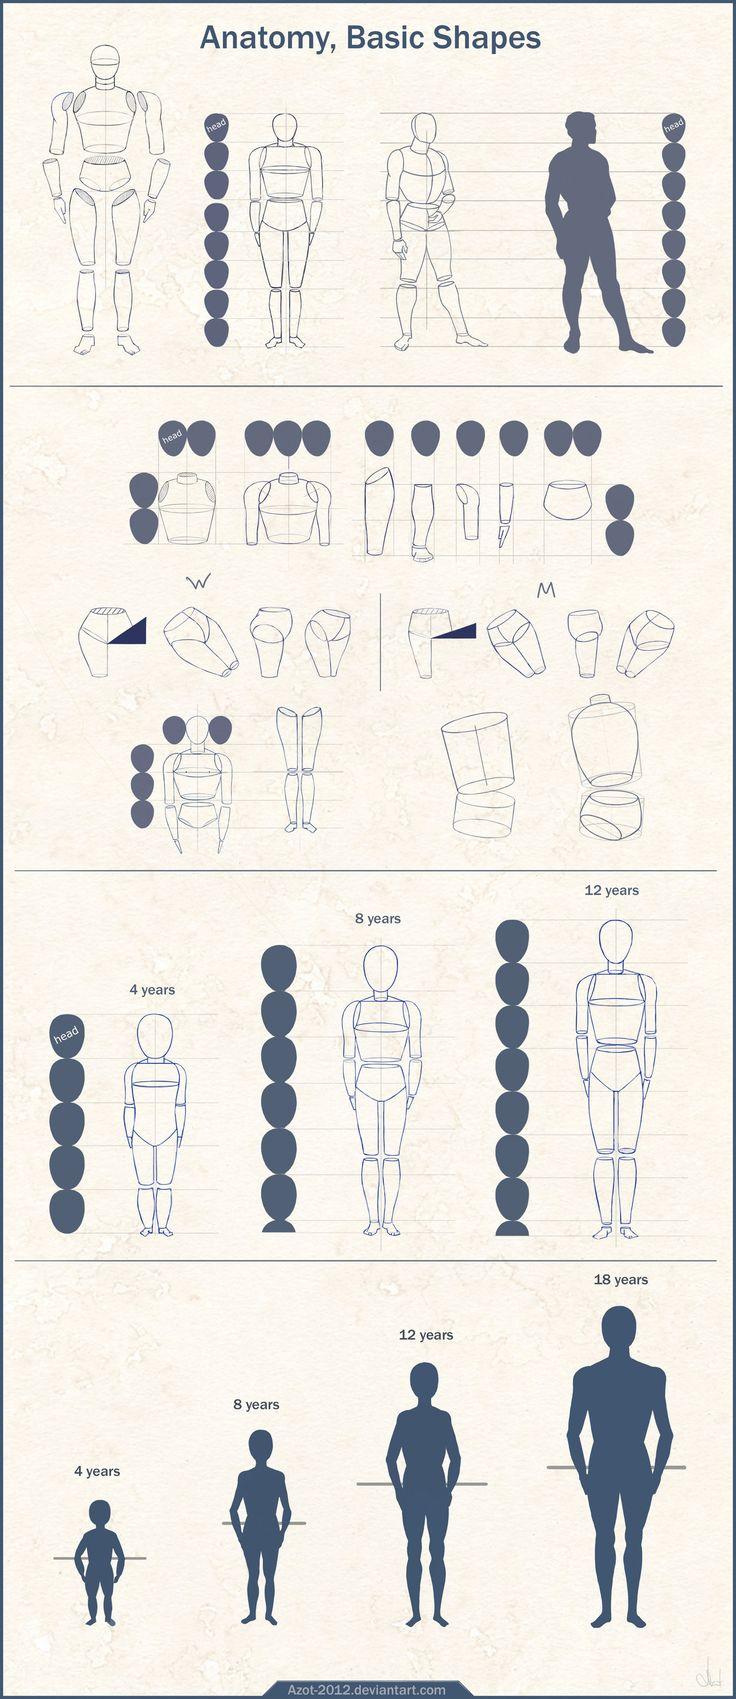 #drawing Anatomy Basic Shapes by Azot-2012.deviantart.com